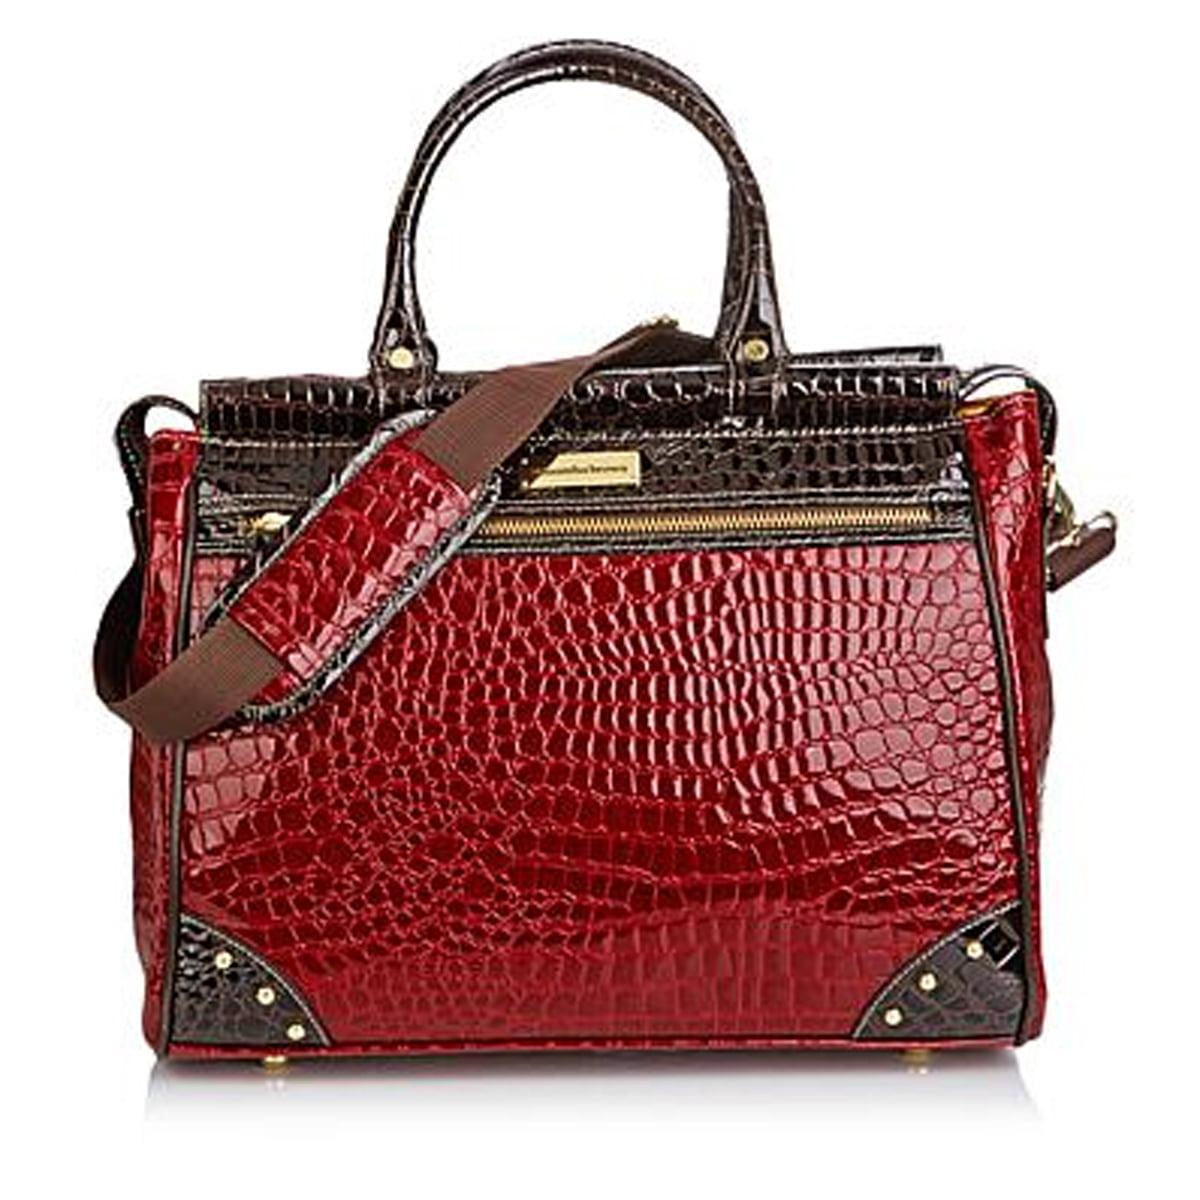 Plus Extras~Burgundy Crossbody Bag Samantha Brown Weekender Set